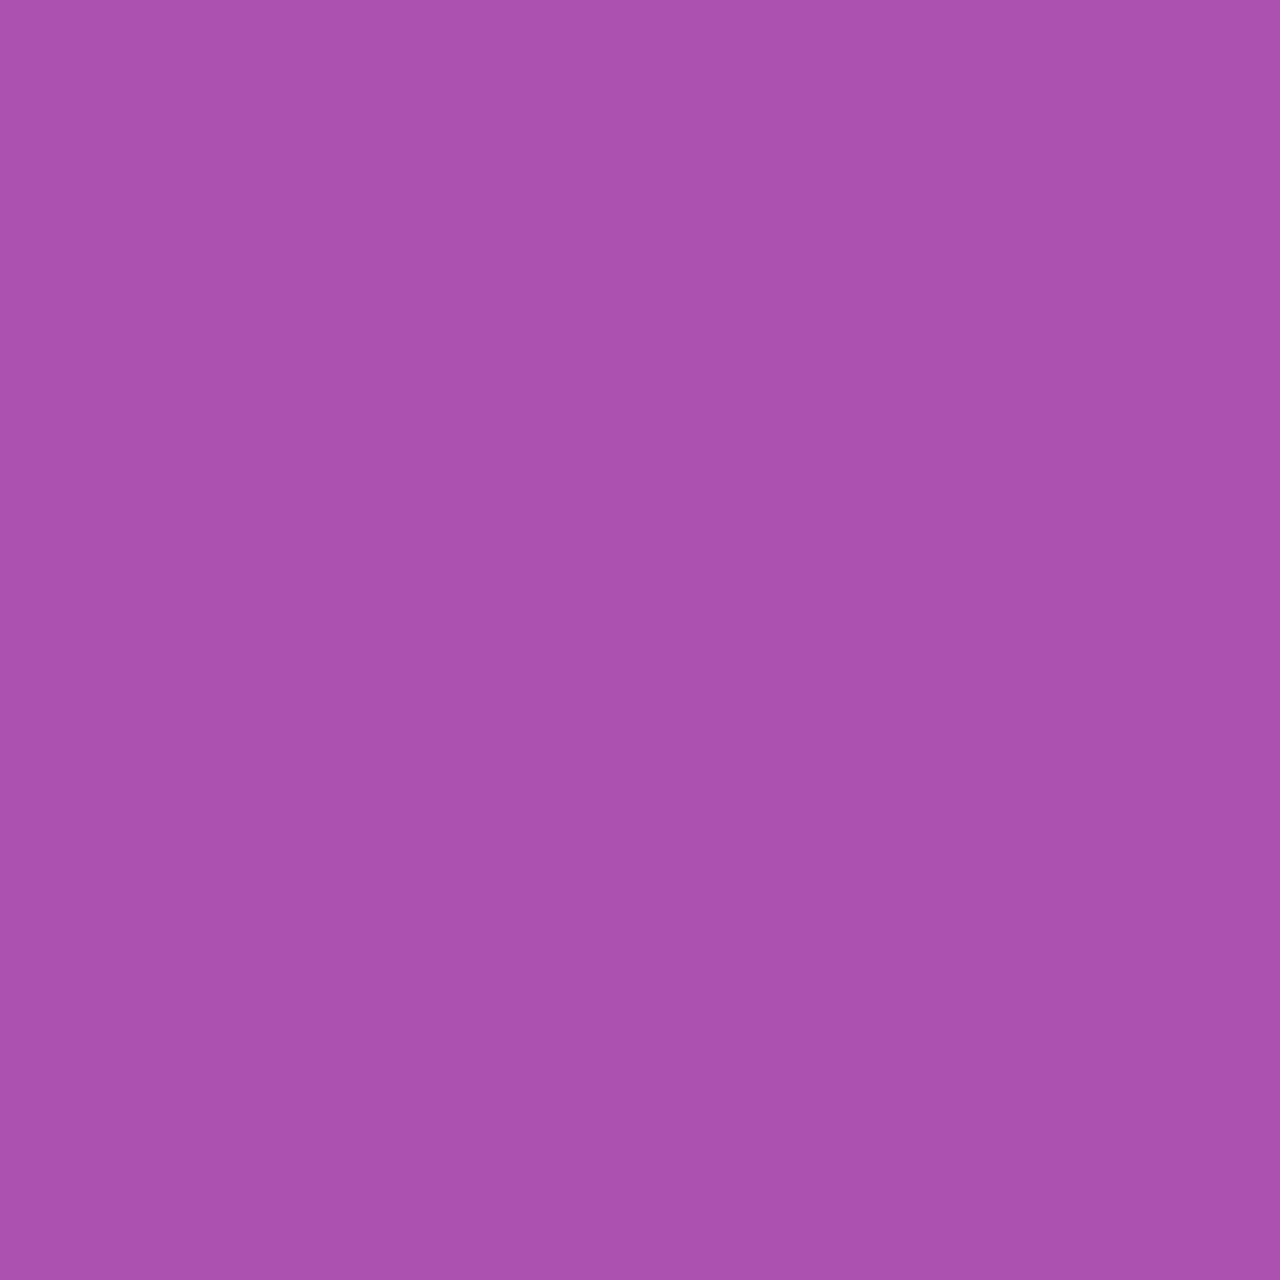 "#0344 Rosco Gels Roscolux Follies Pink, 20x24"""